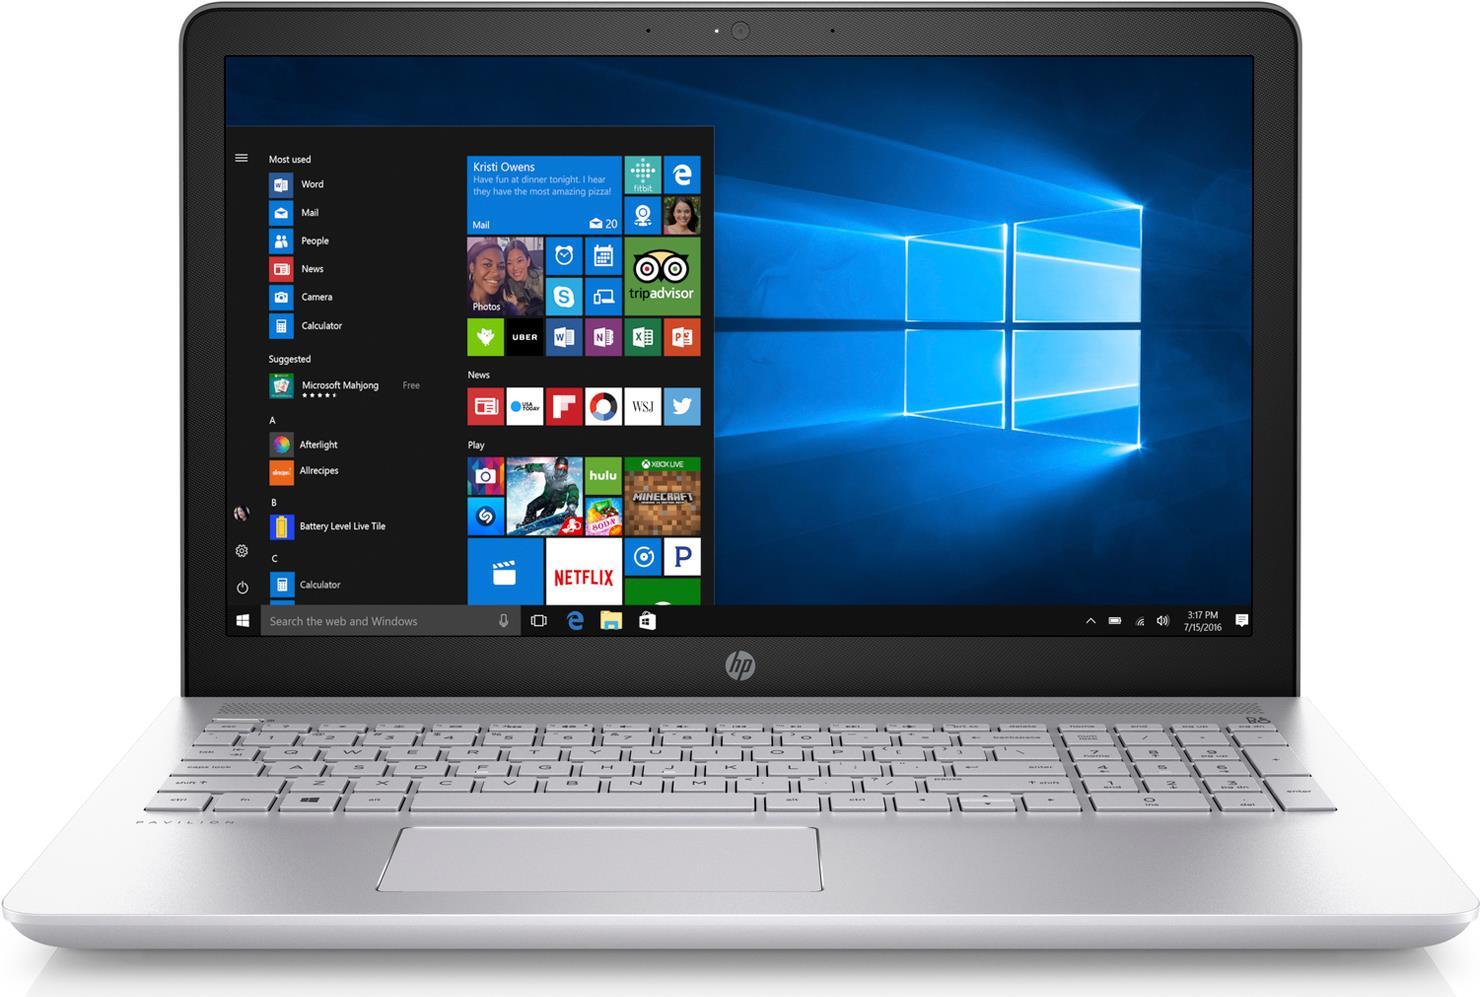 Notebooks, Laptops - HP Pavilion 15 cc009ng Core i3 7100U 2.4 GHz FreeDOS 2.0 8 GB RAM 128 GB SSD 1 TB HDD DVD Writer 39.6 cm (15.6) 1920 x 1080 (Full HD) HD Graphics 620 Wi Fi, Bluetooth Mineral Silberfarben (Oberseite), natürlich silberfarben  - Onlineshop JACOB Elektronik